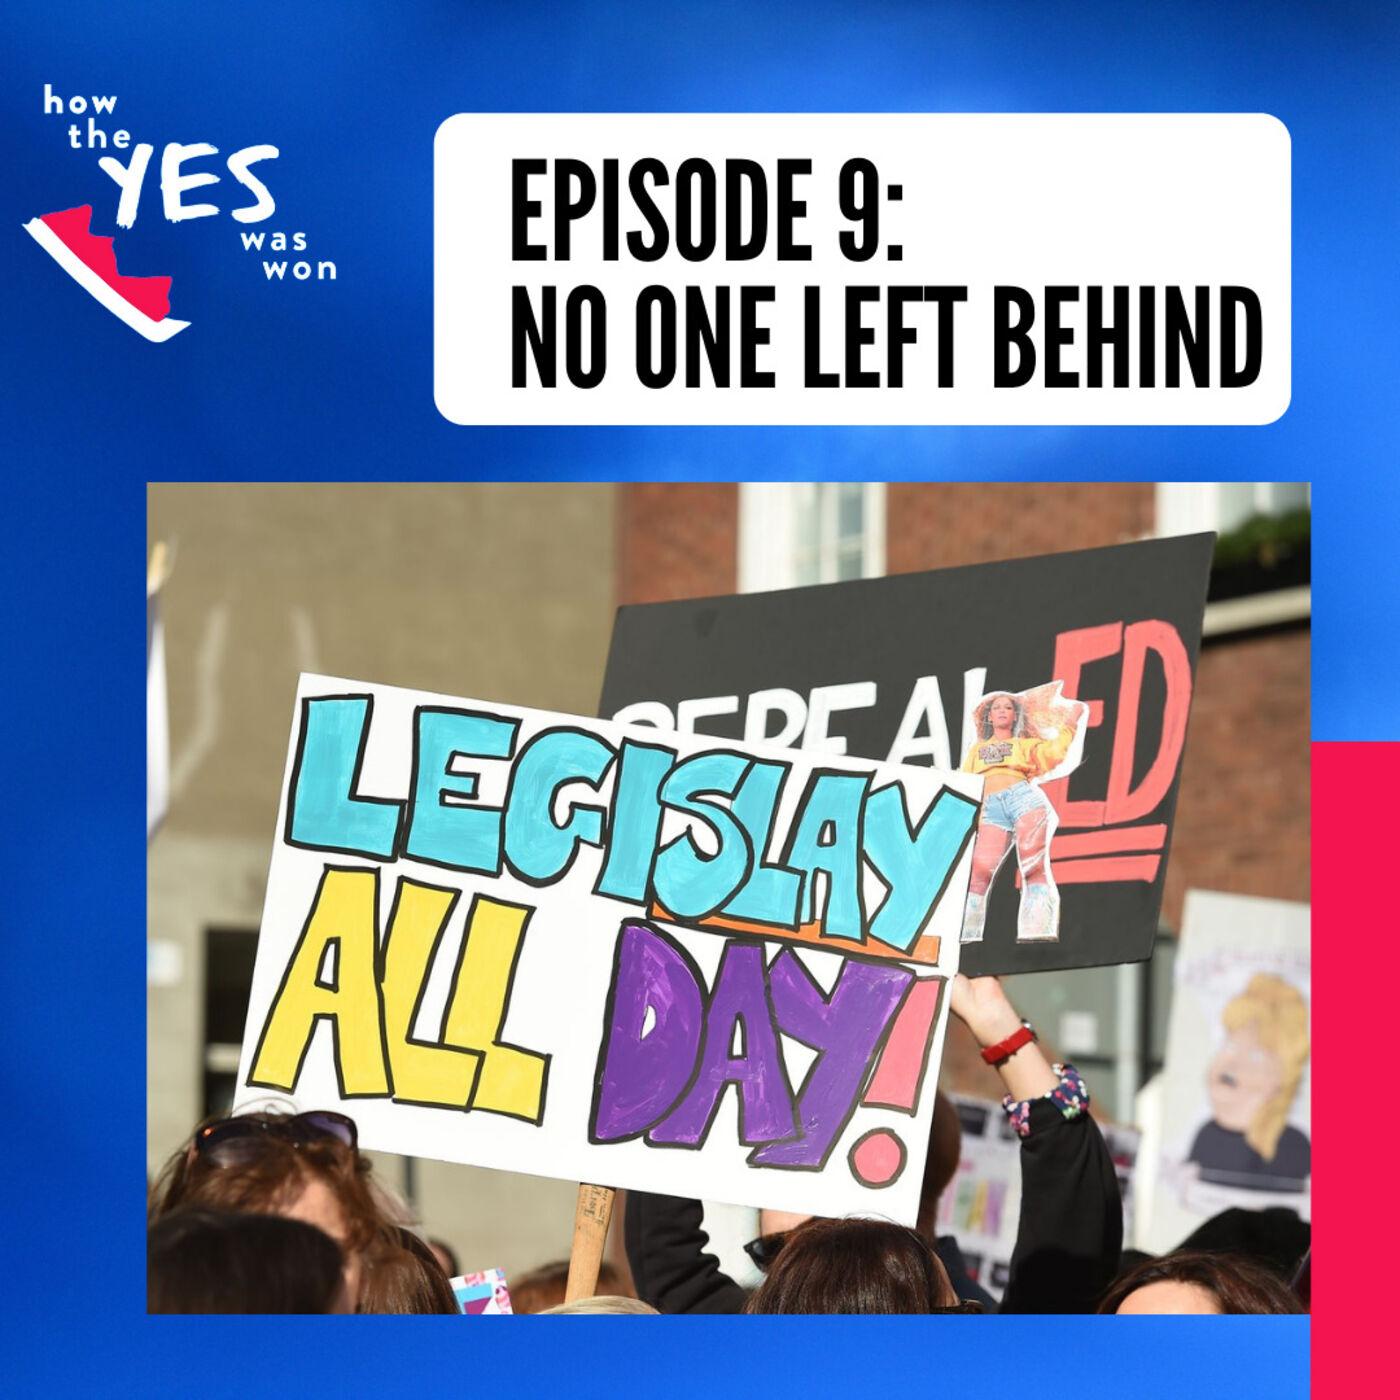 Episode 9: No One Left Behind